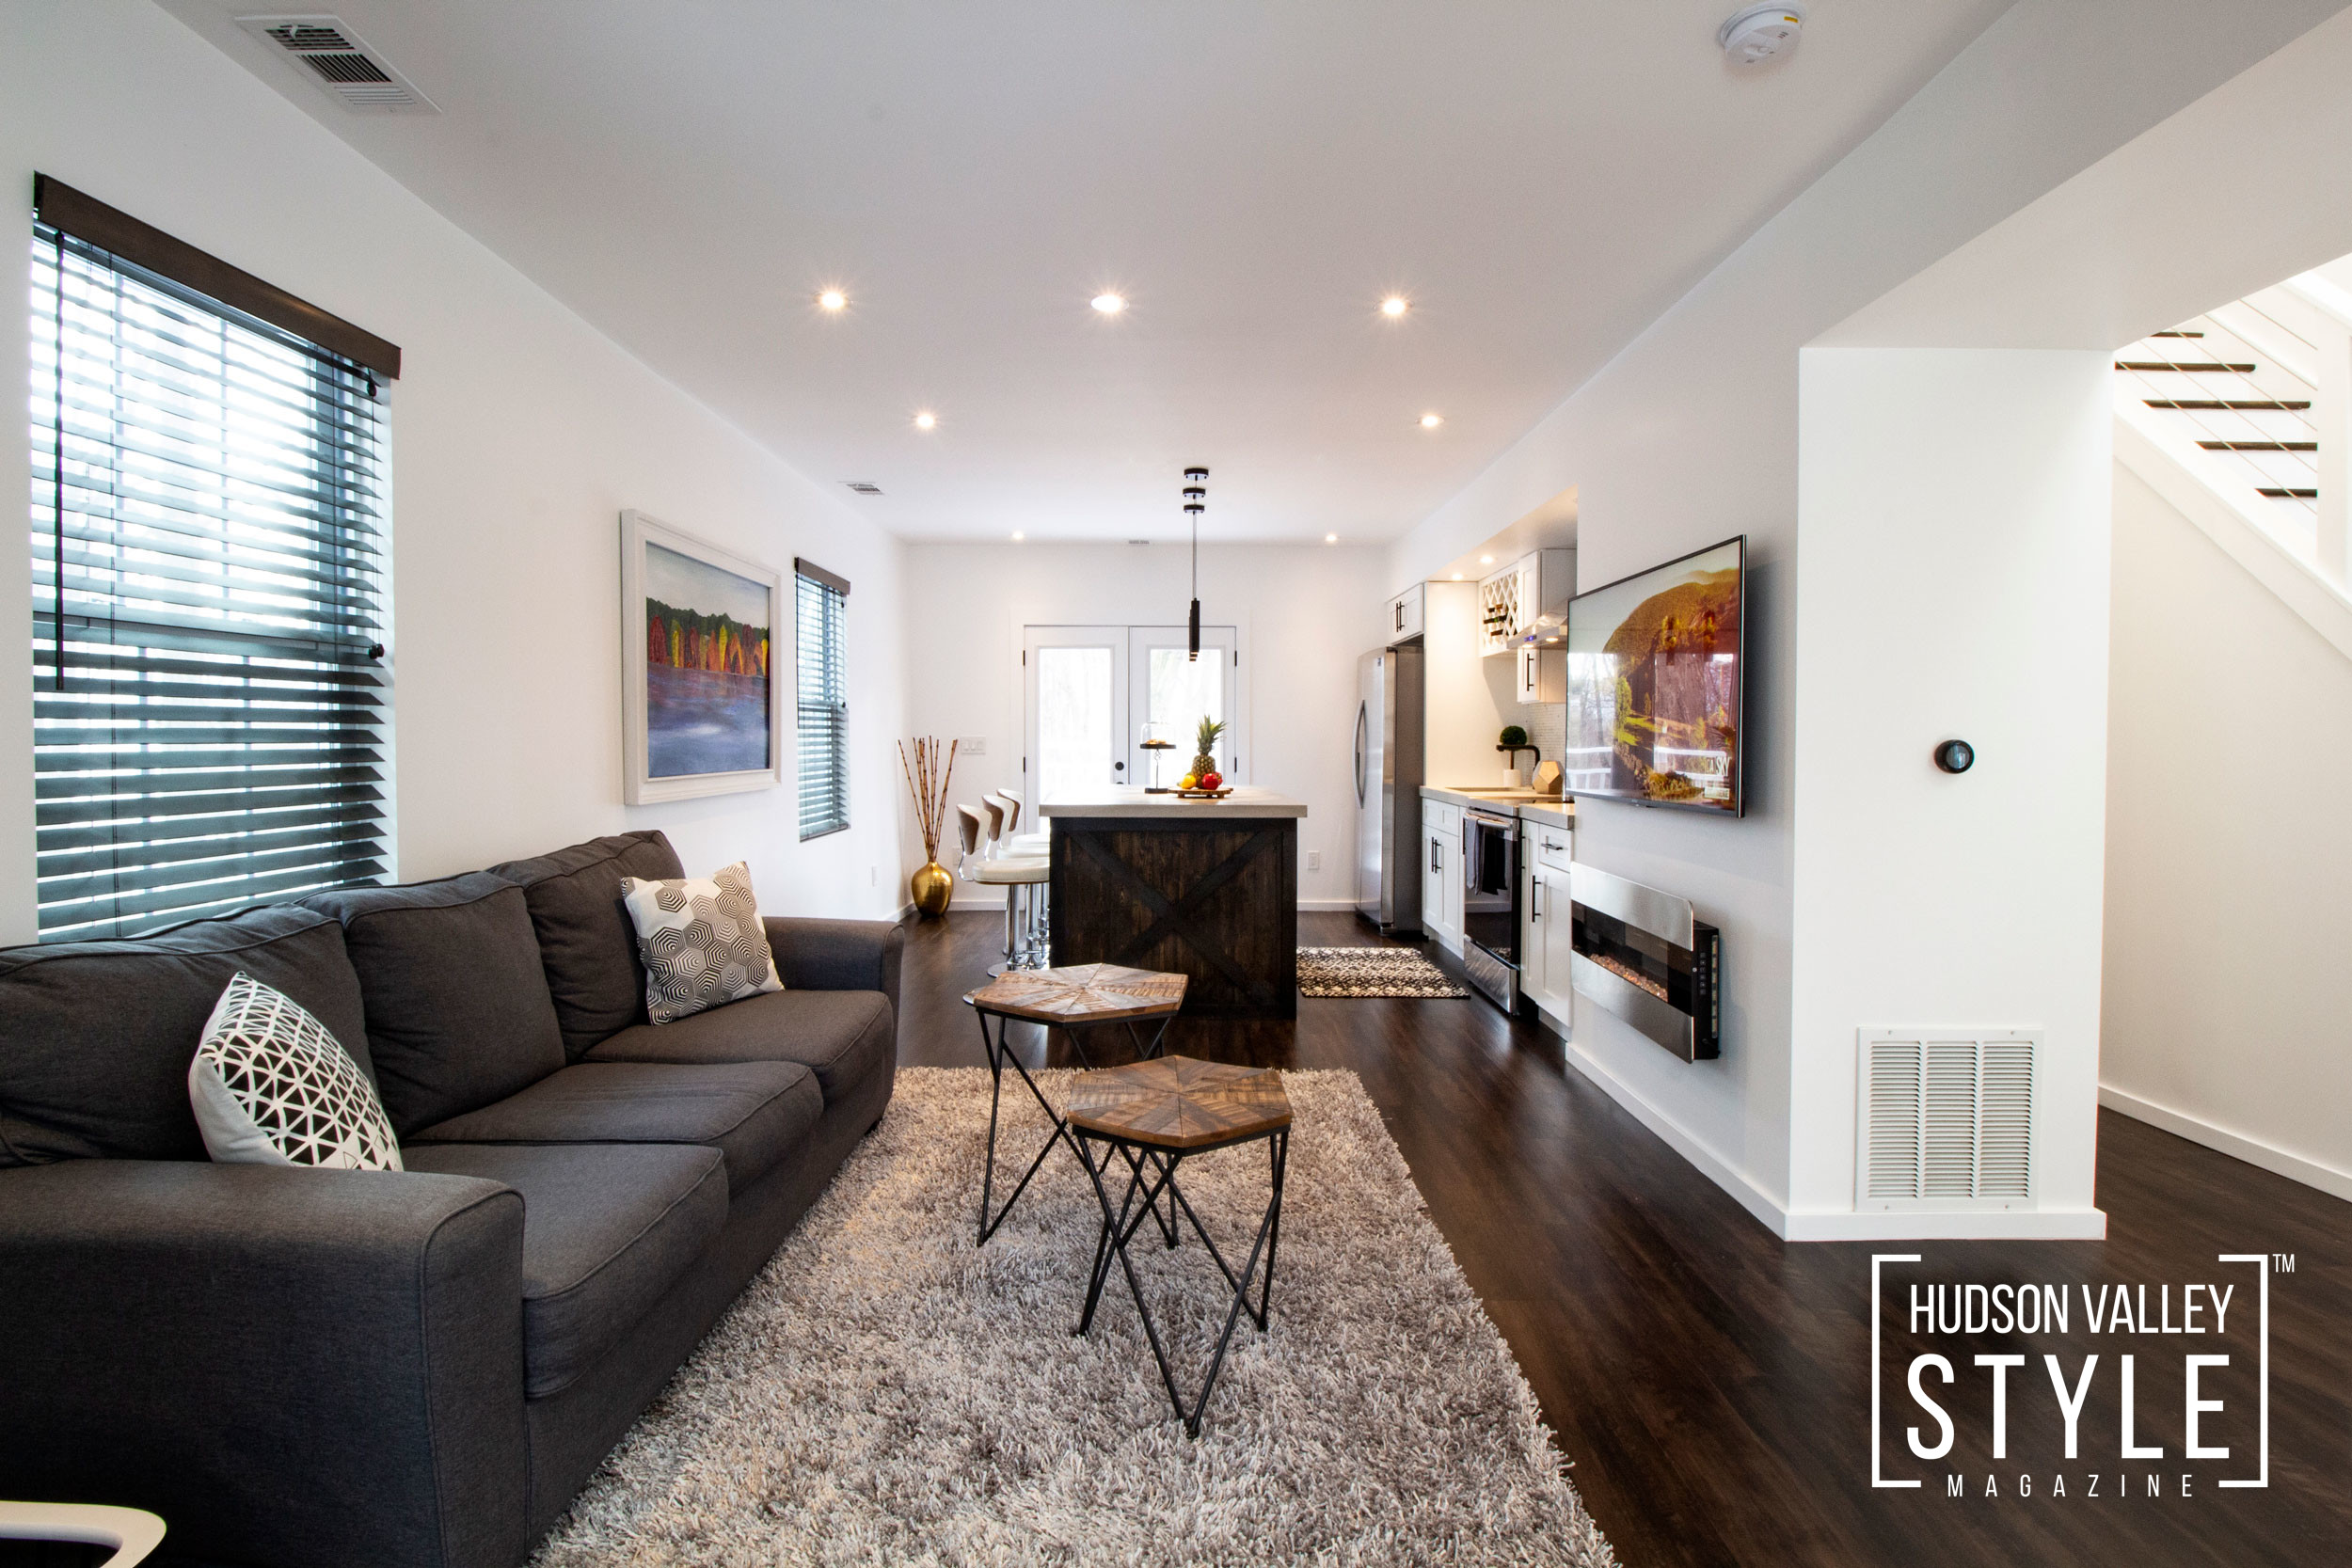 living room interior design 2020 | 2020 Interior Design Trends by Designer Maxwell L ...